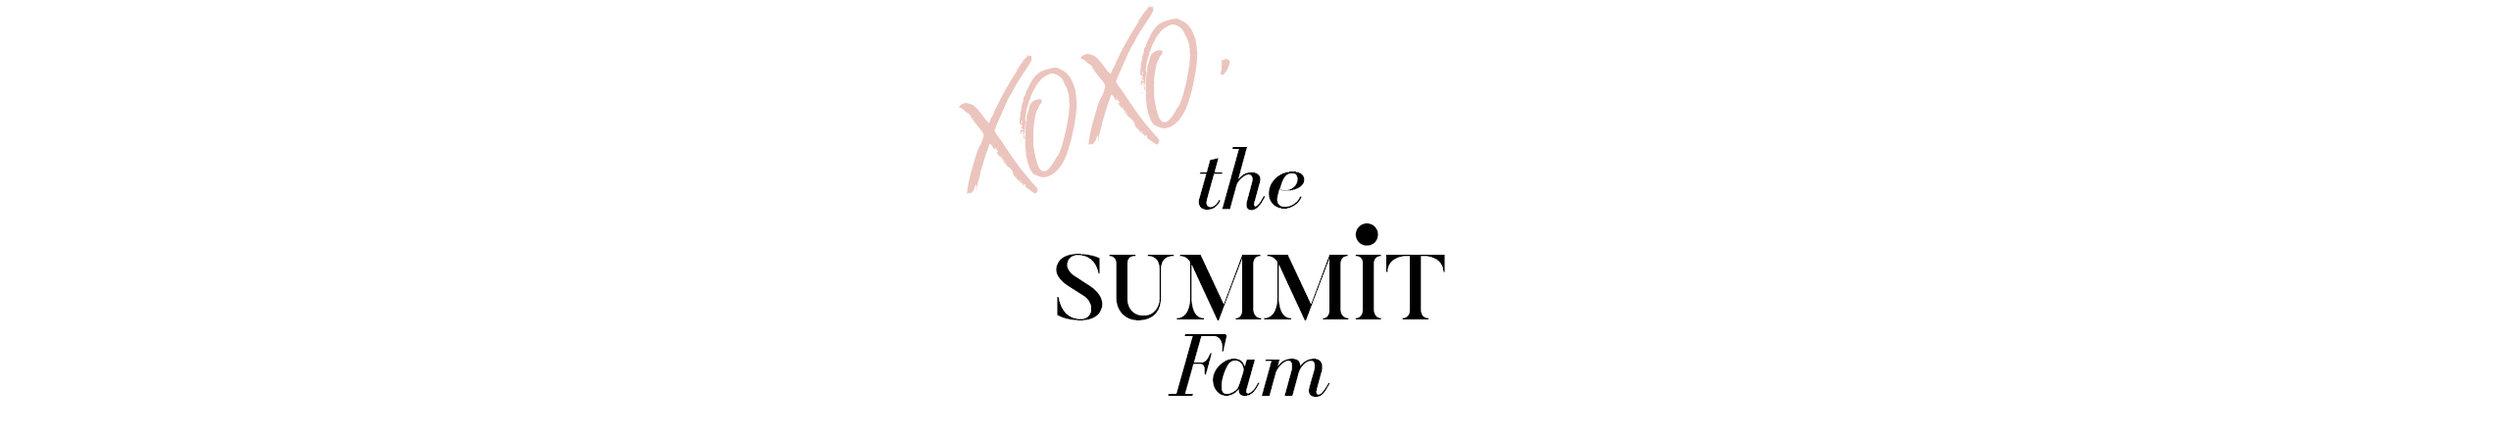 The Summit Fam Signature.jpg